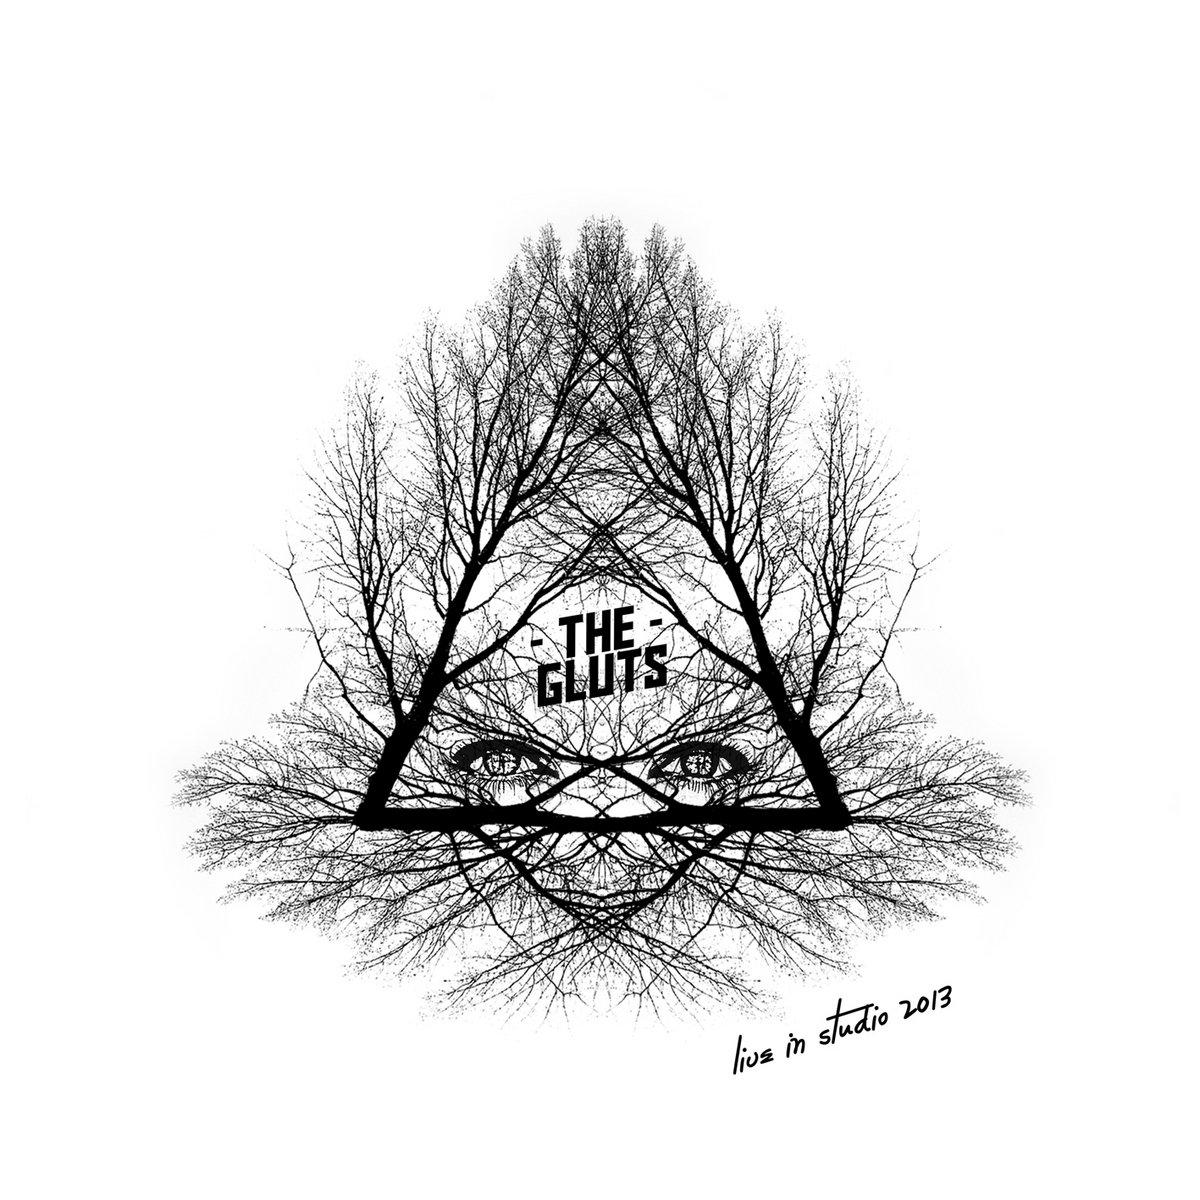 The Connells - 74 -75 текст MP3 песни, слова и перевод